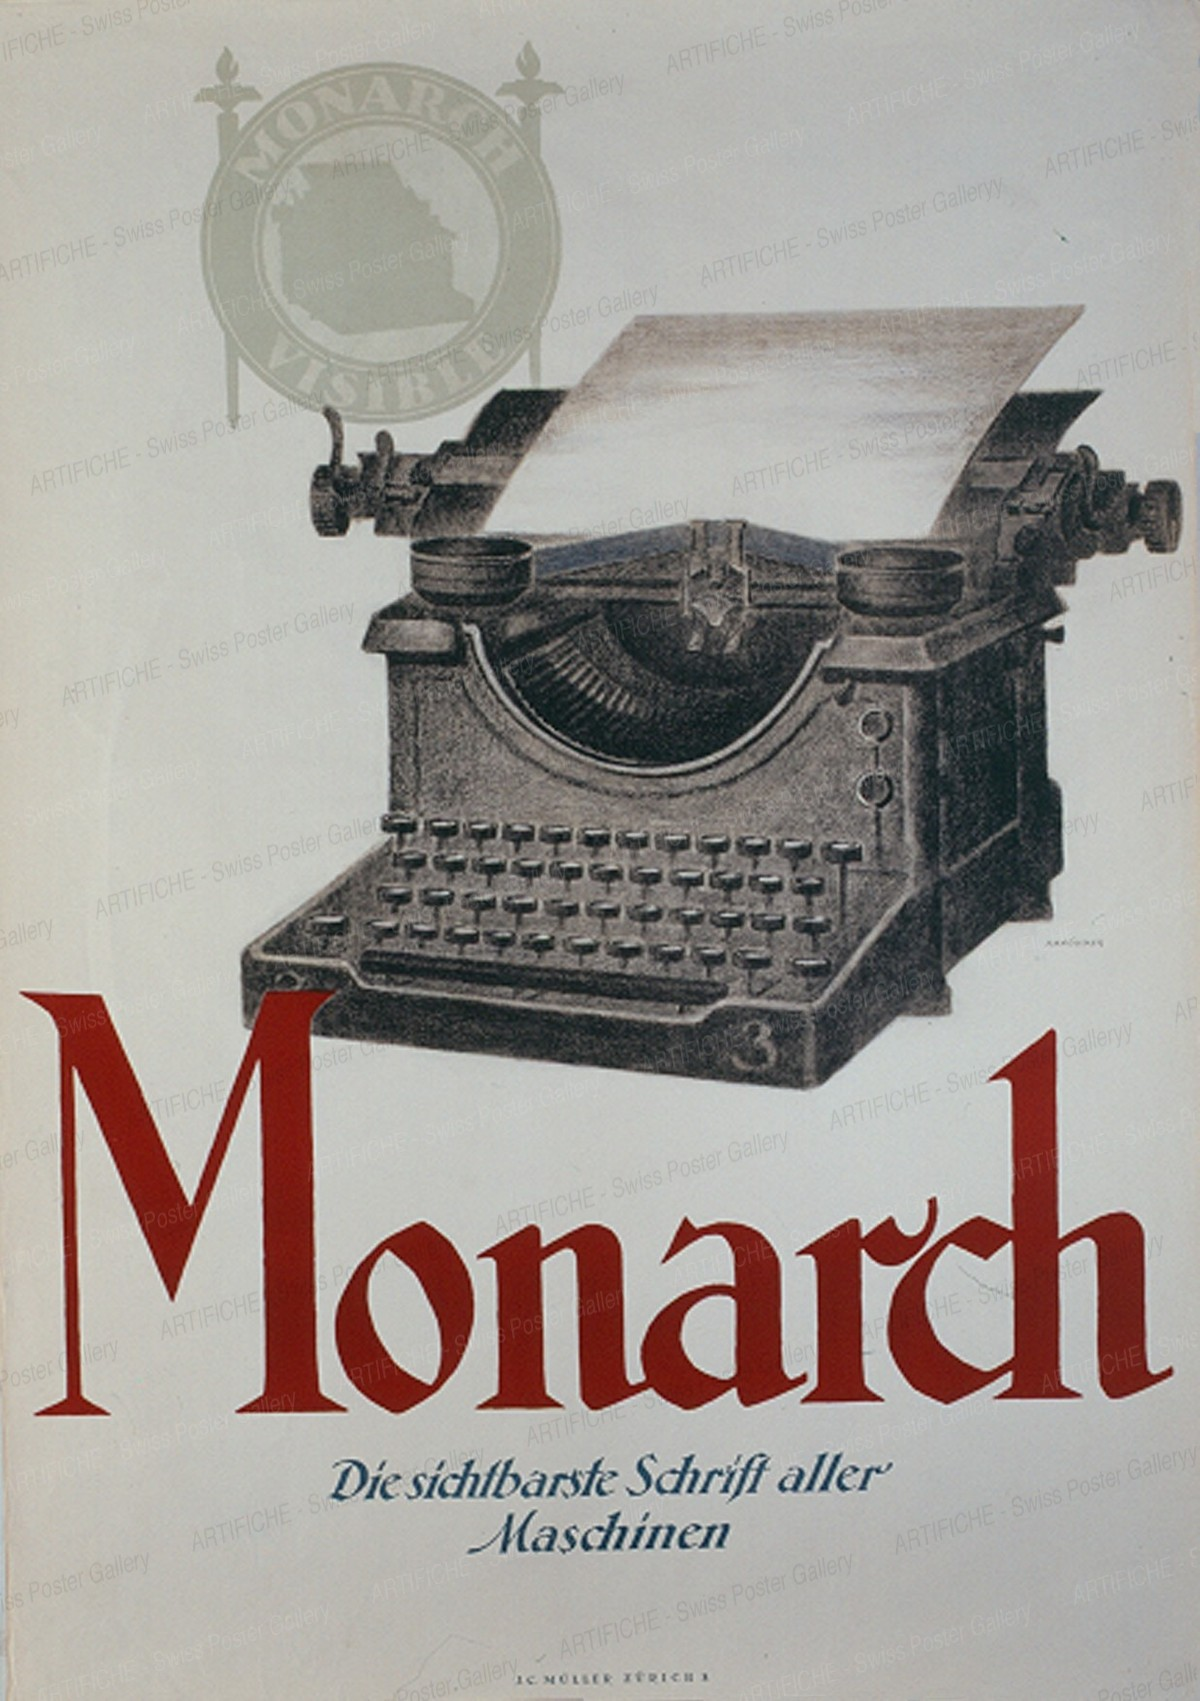 Monarch – Typewriter, Hermann Alfred Koelliker